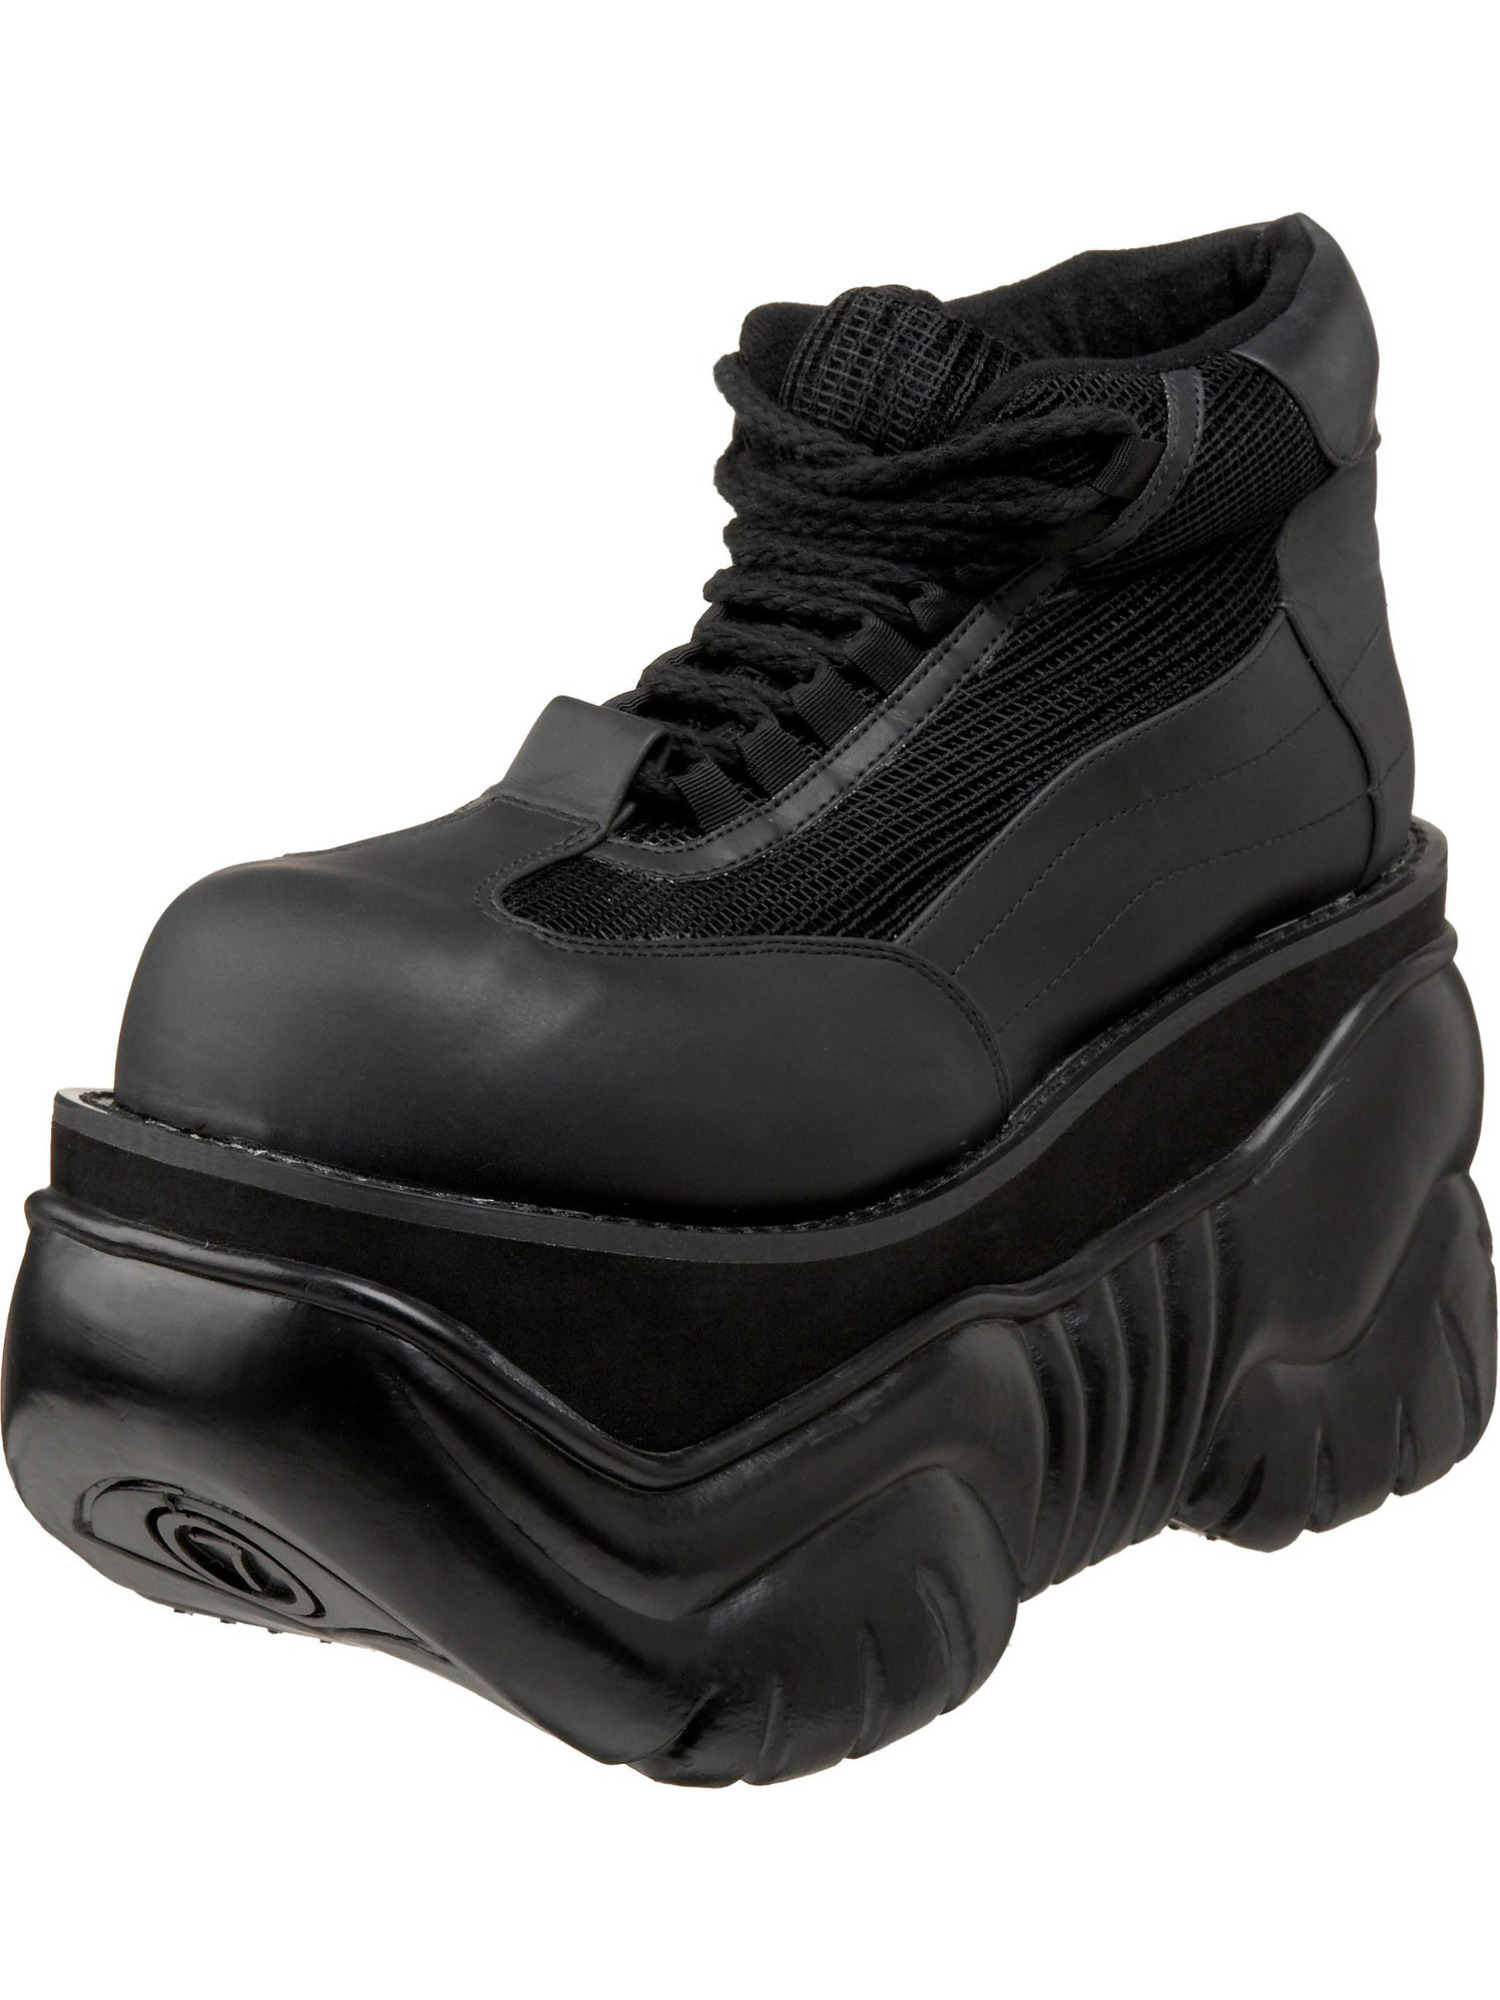 MENS SIZING 4 Inch Platform Shoe Men's Sneaker Black PU Lace Up DEMONIA